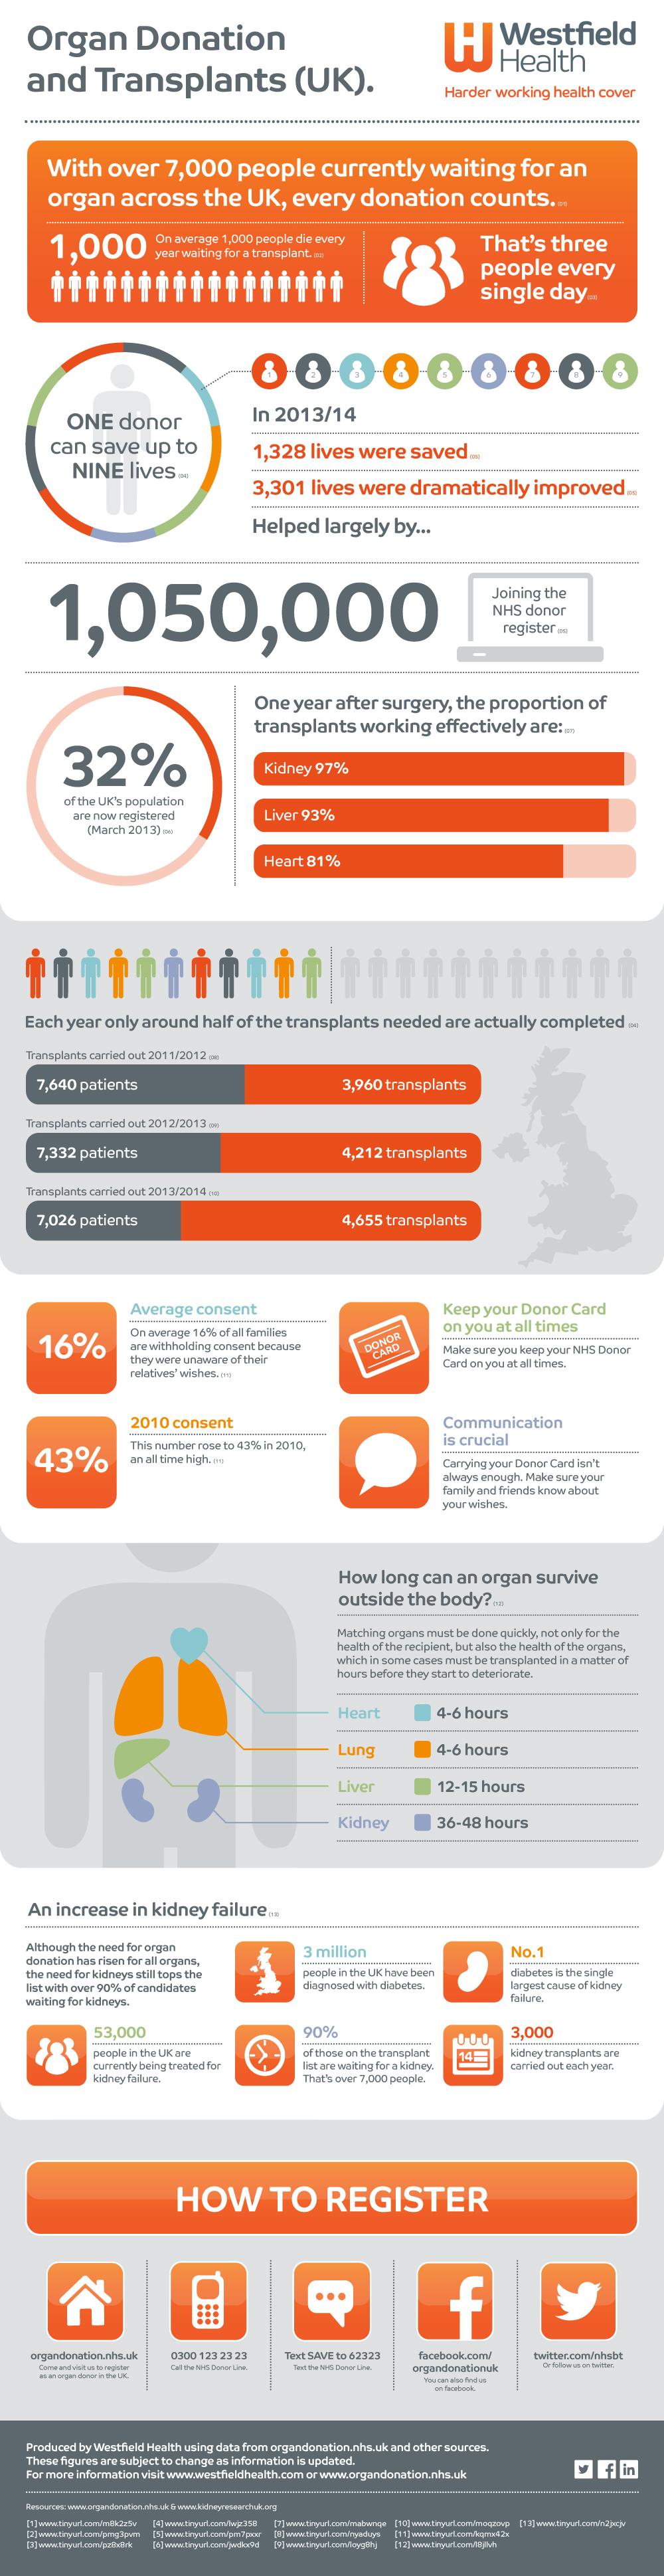 organ-donation-transplant-infographic